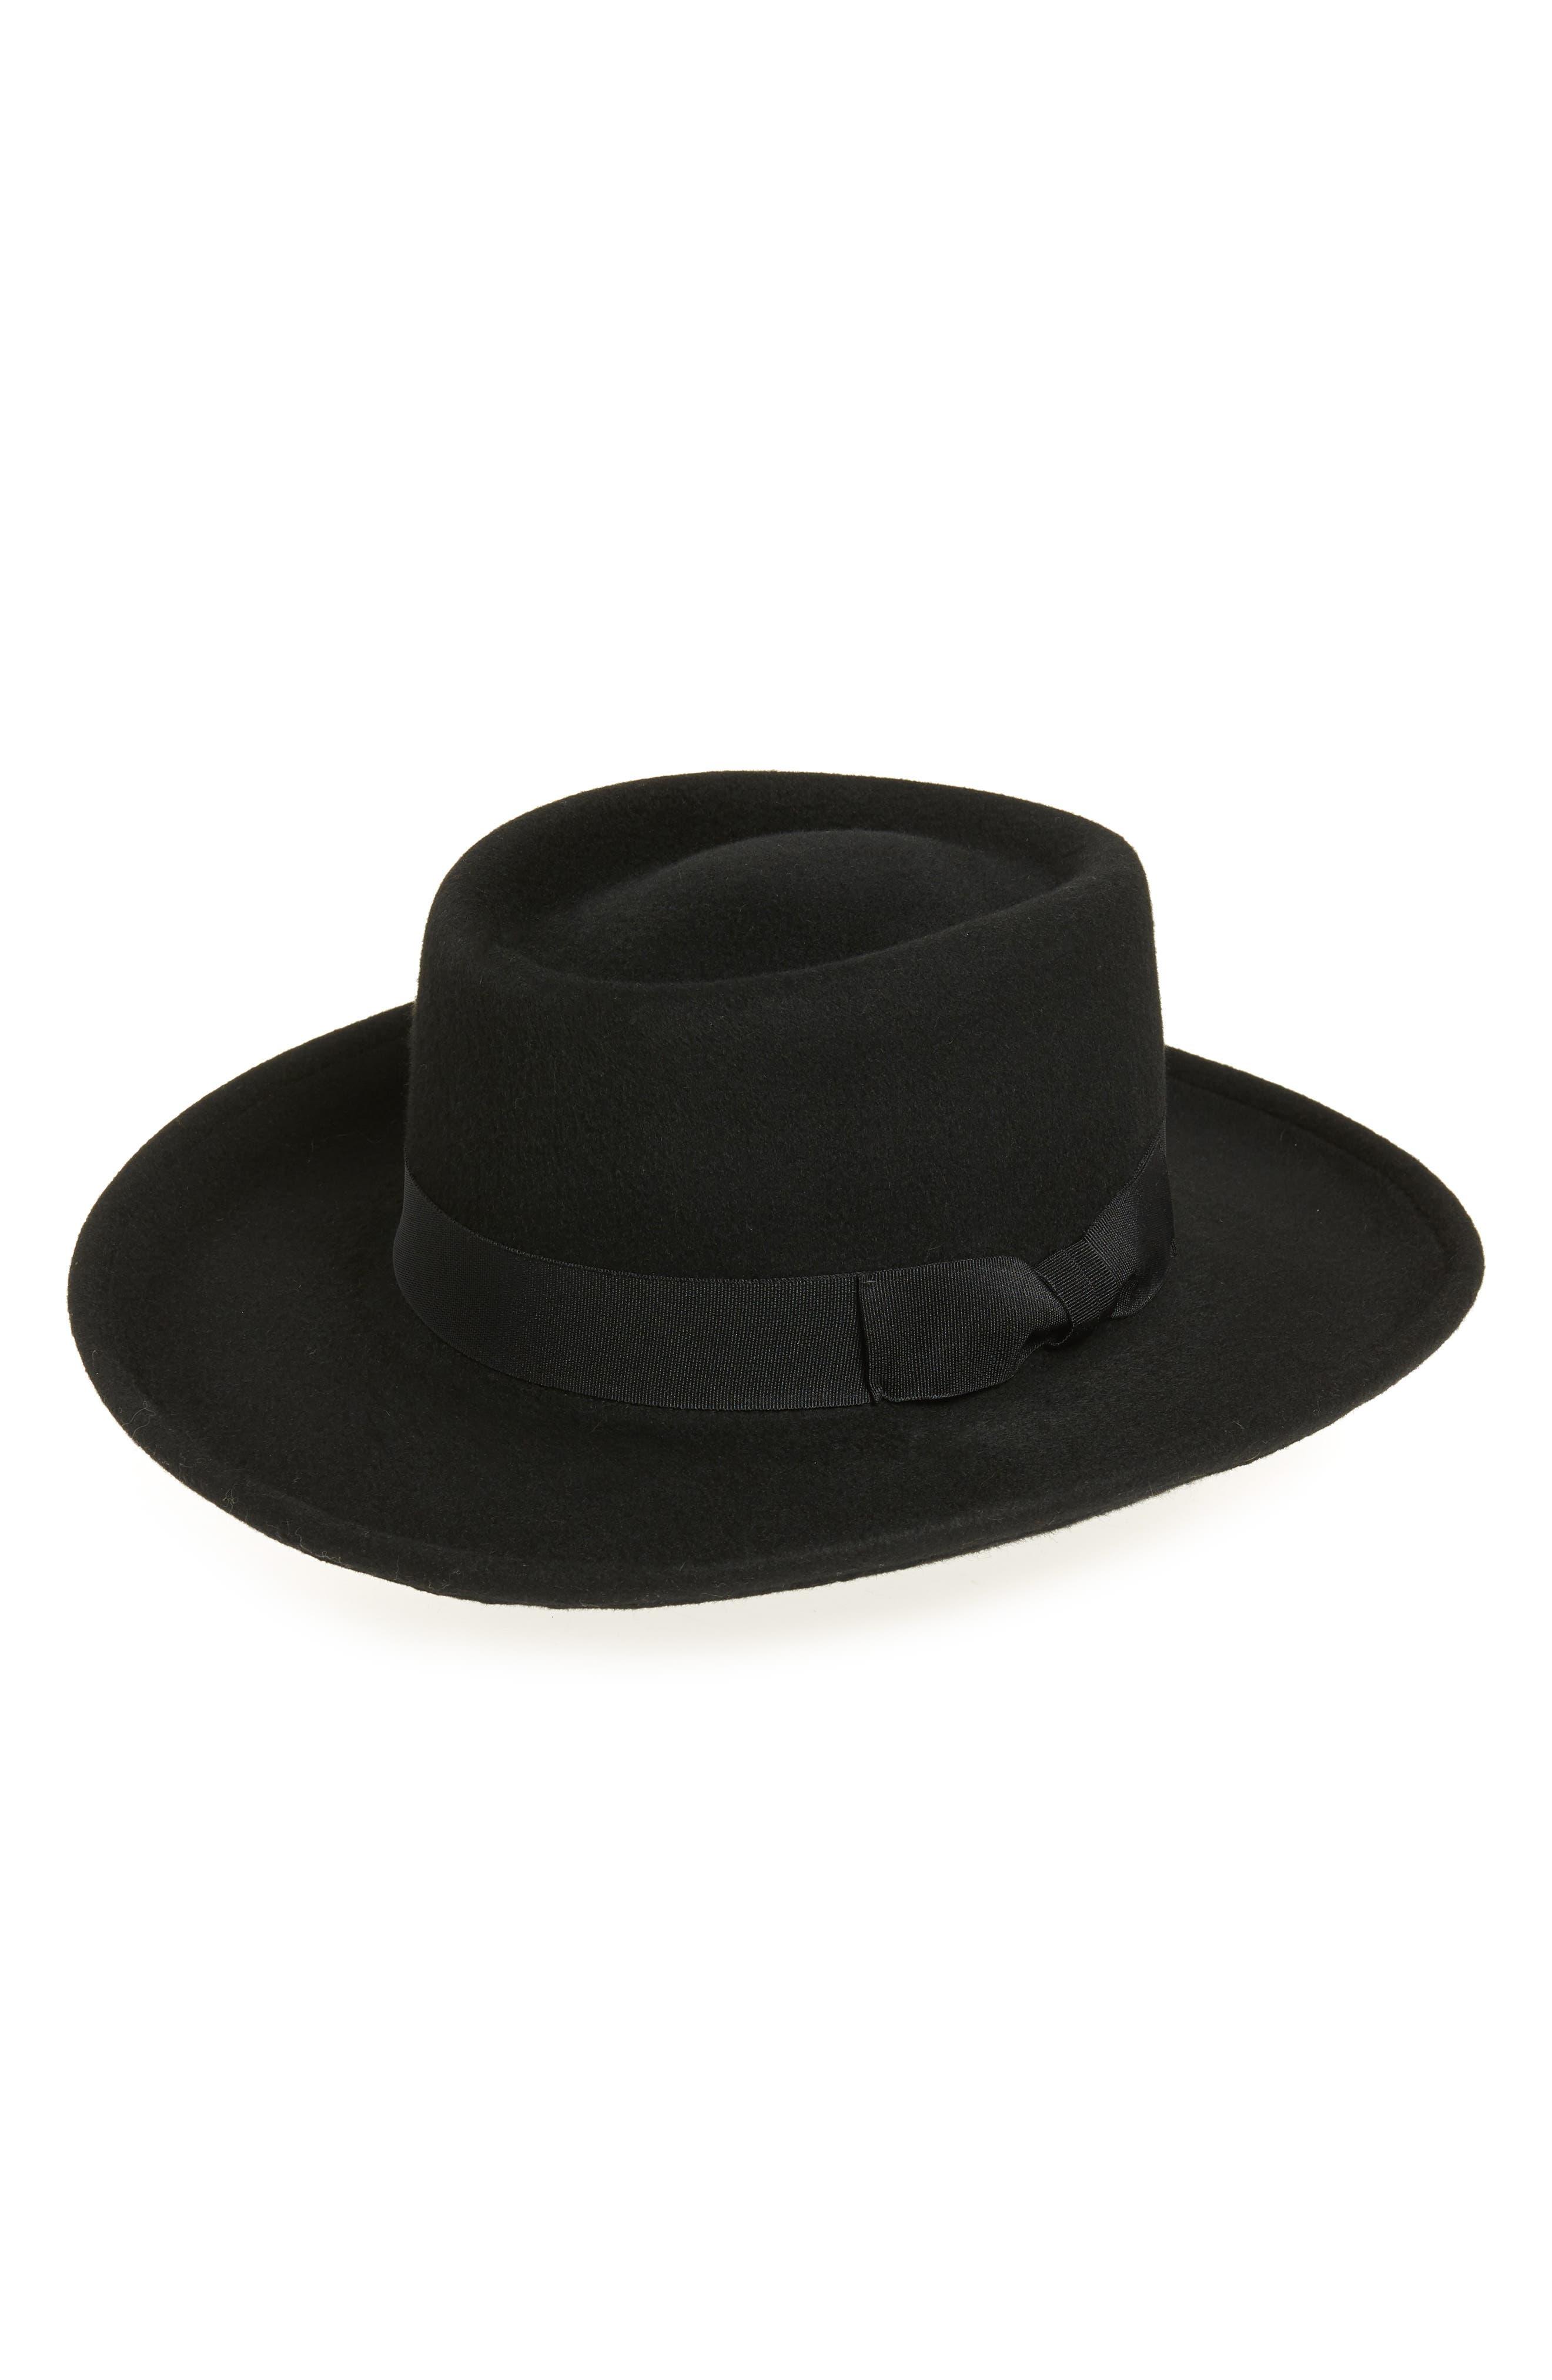 1920s Mens Hats & Caps | Gatsby, Peaky Blinders, Gangster Womens Eric Javits Planter Packable Wool Felt Hat - $215.00 AT vintagedancer.com